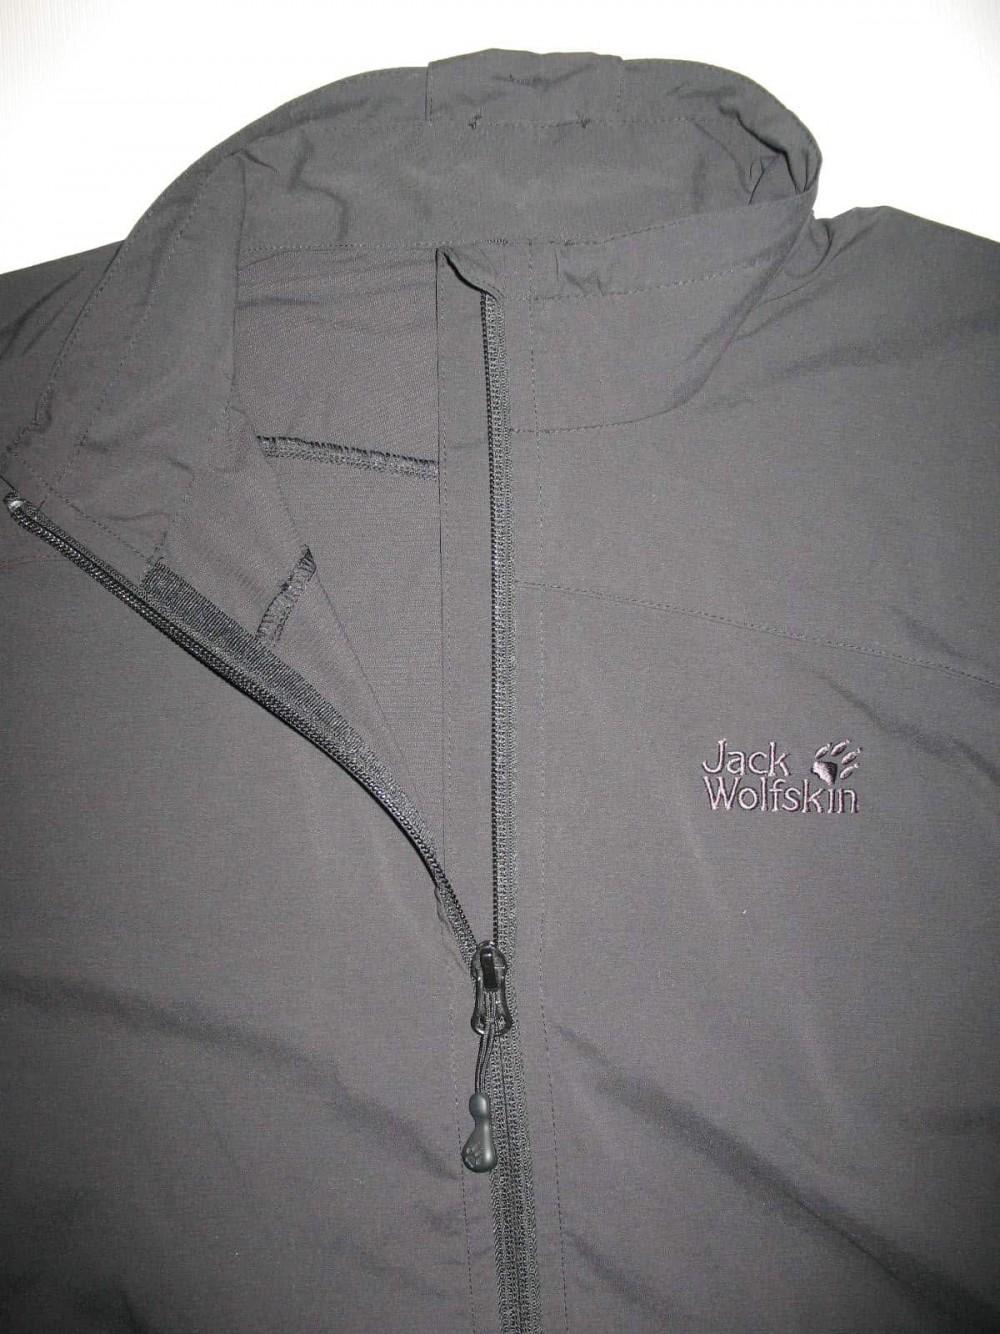 Жилет JACK WOLFSKIN activate softshell vest (размер XL) - 4